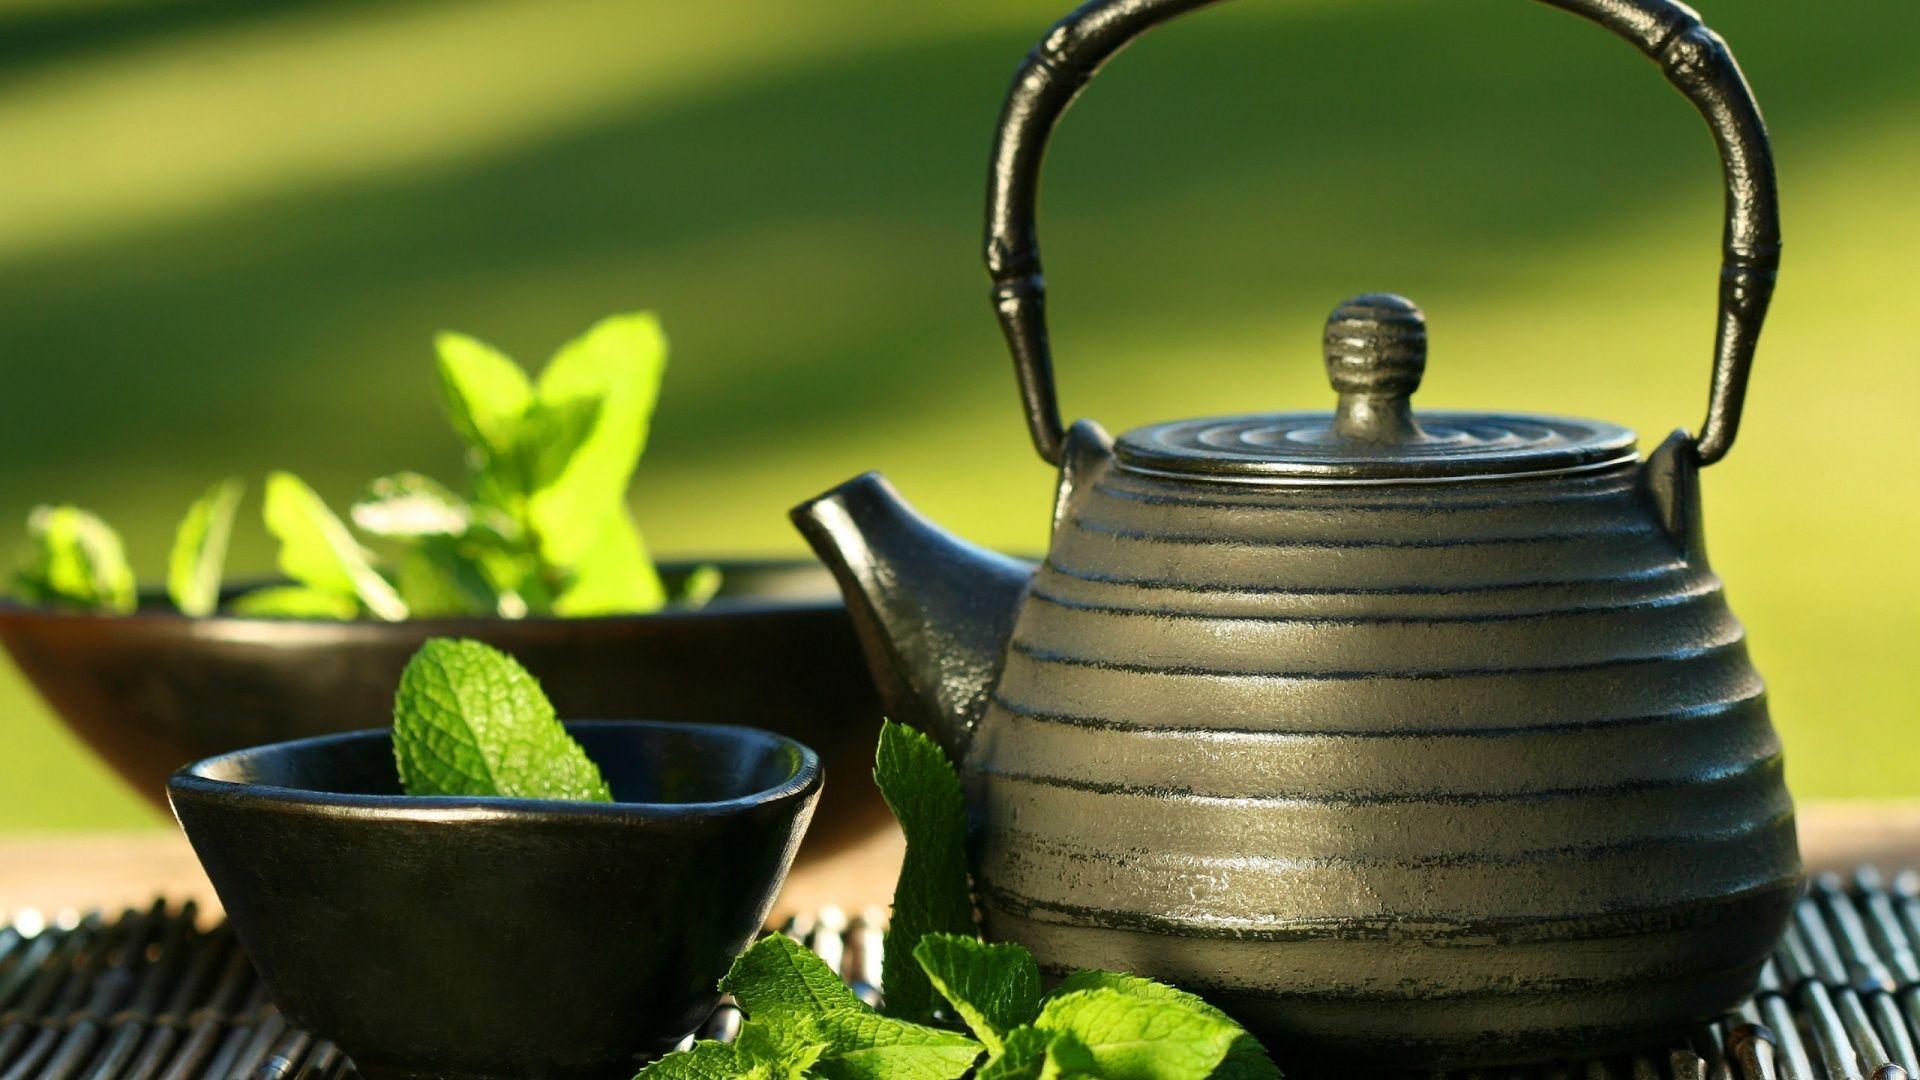 Tea background image